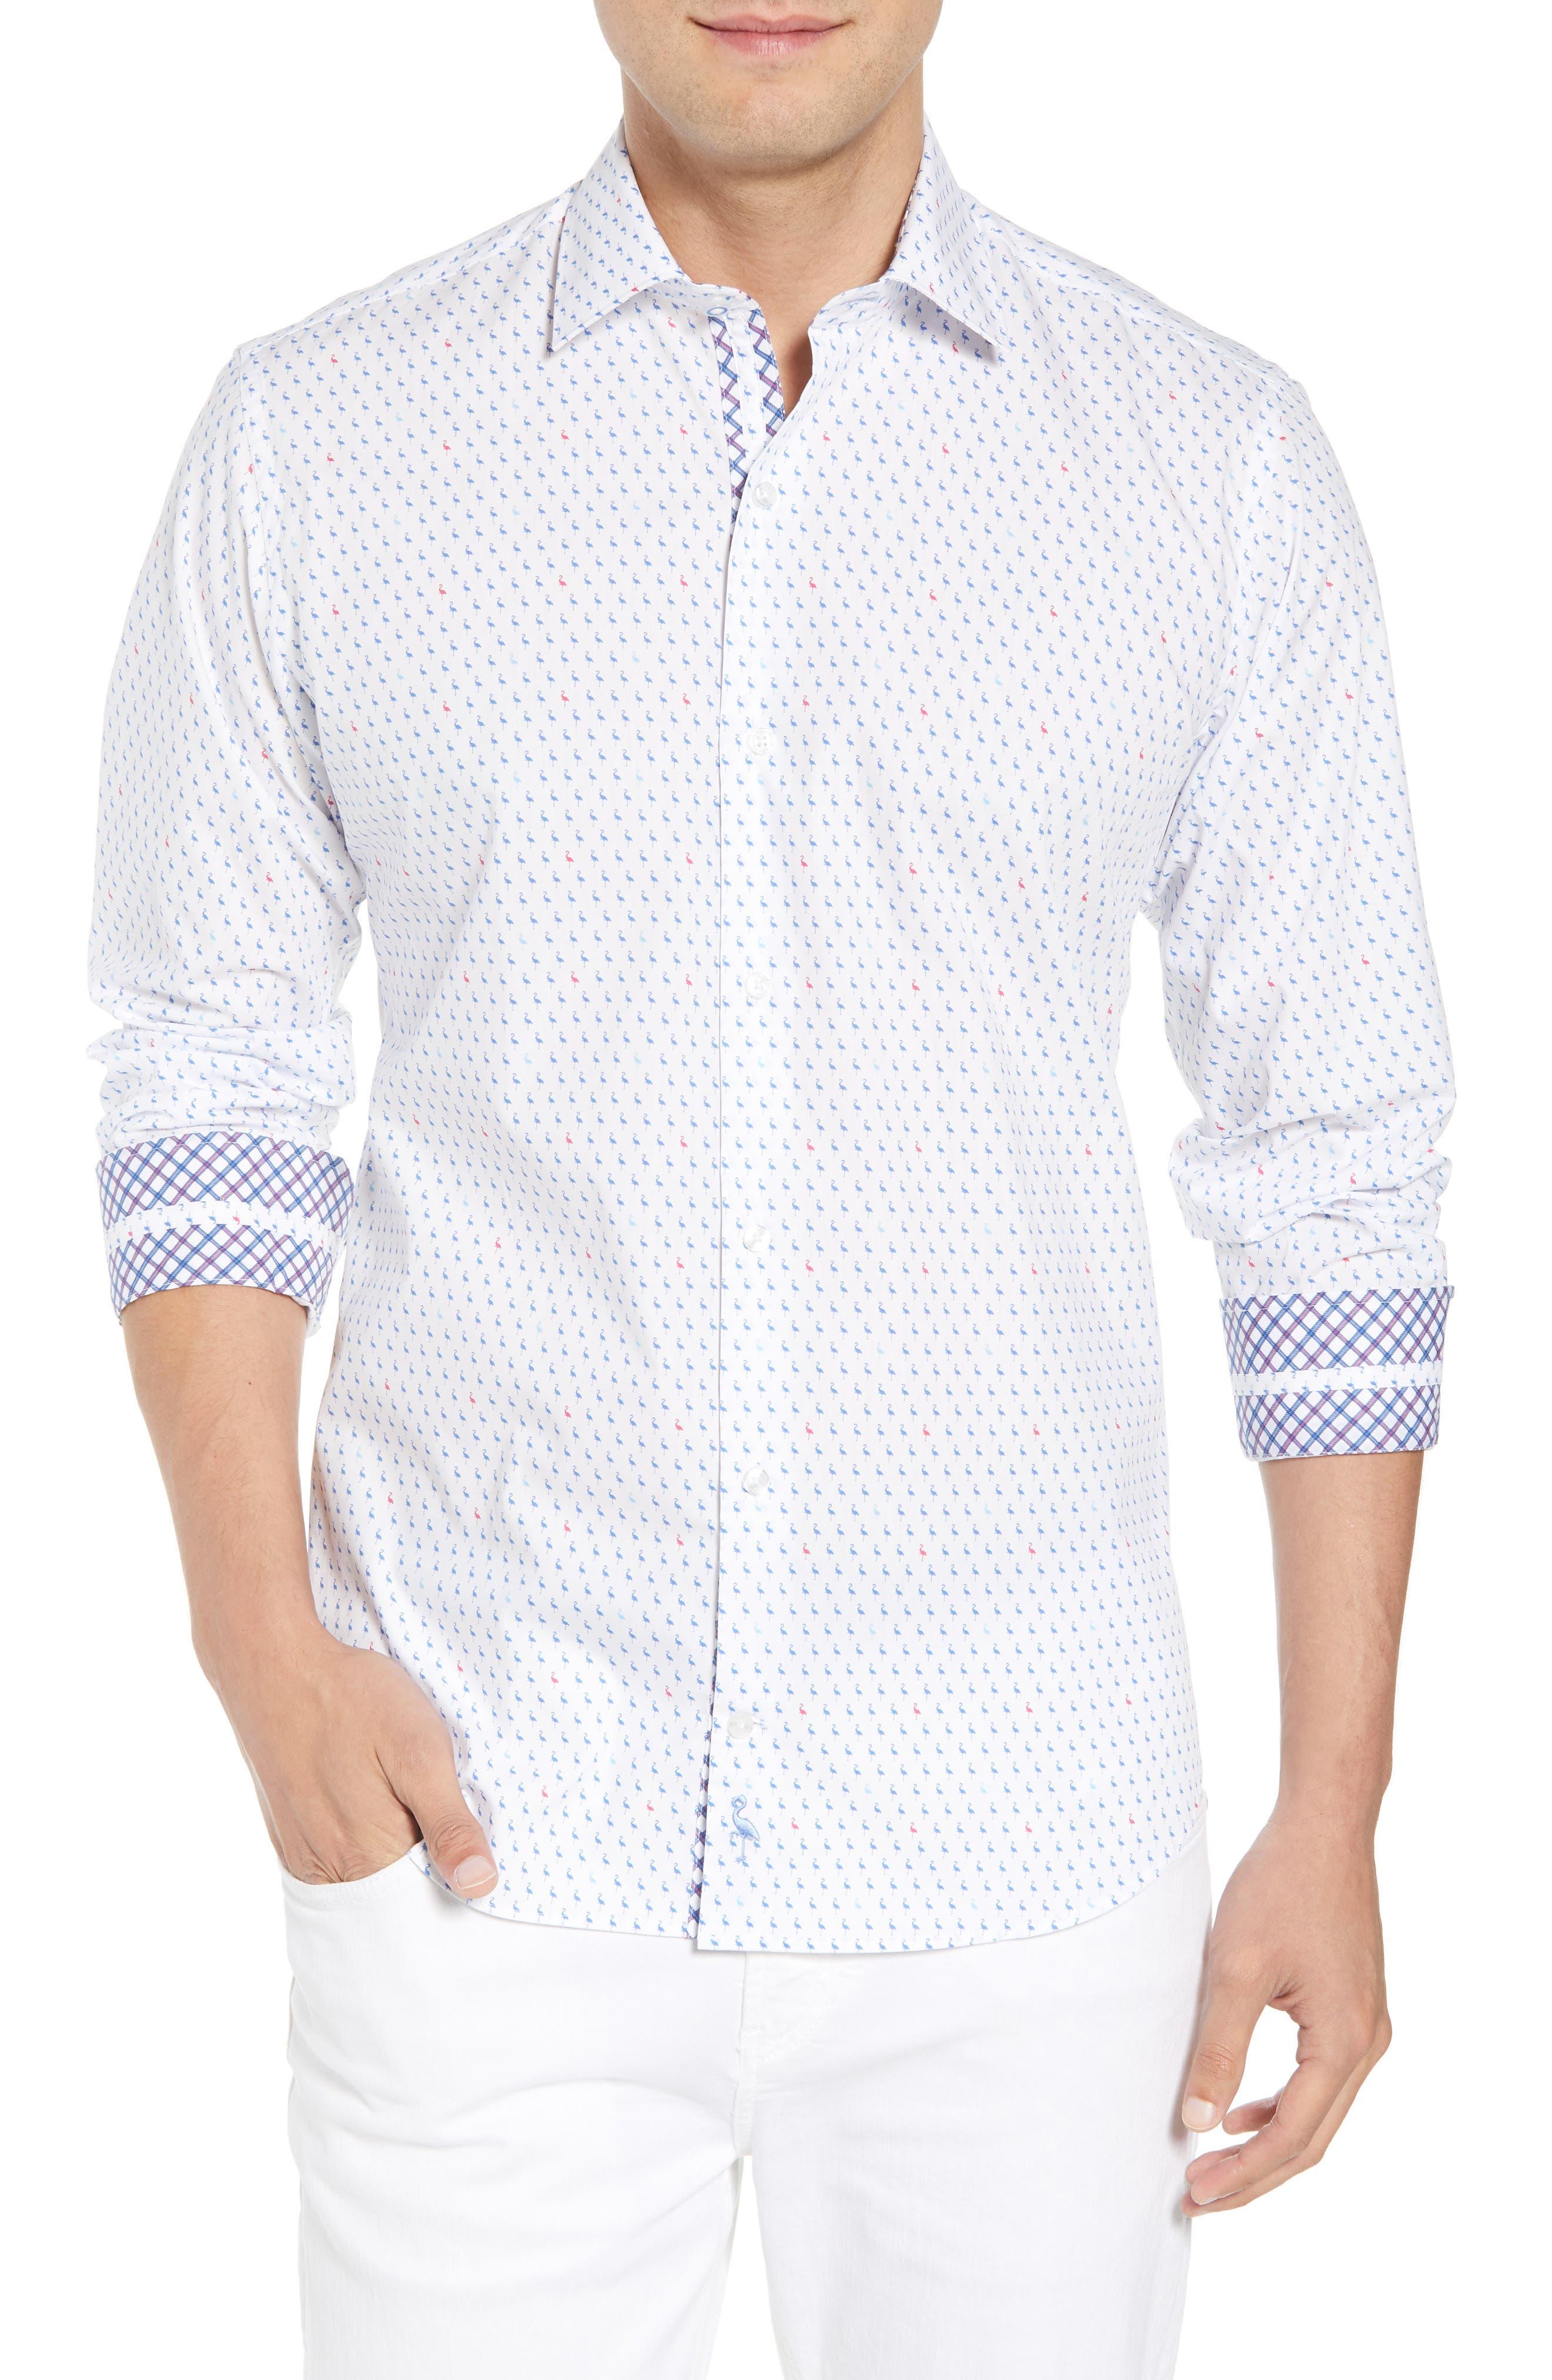 Auden Regular Fit Print Sport Shirt,                             Main thumbnail 1, color,                             Peri Blue